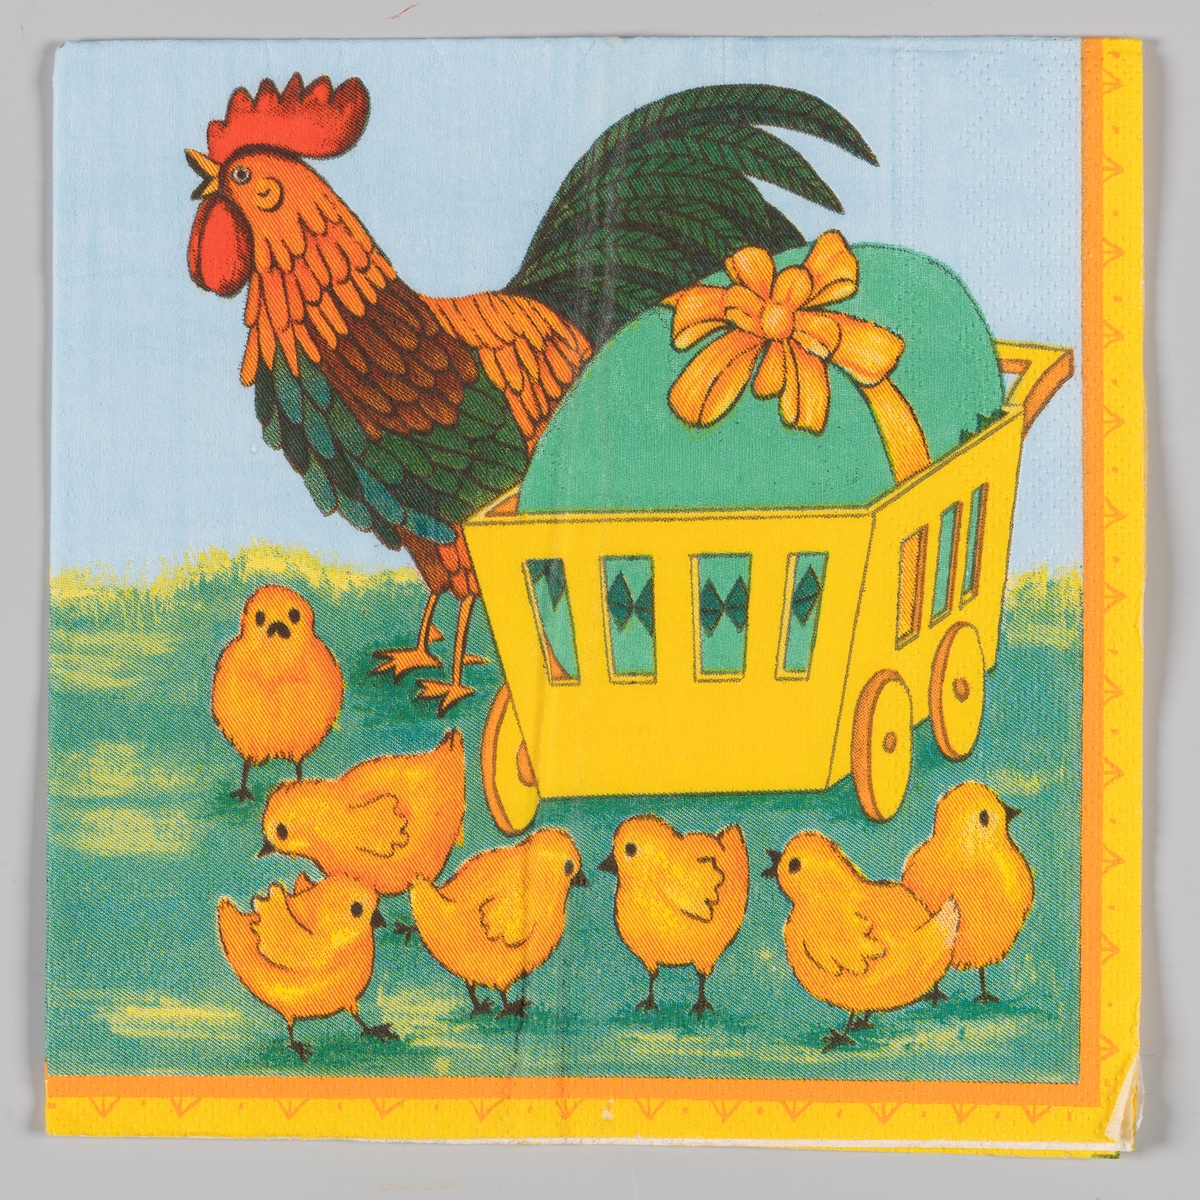 En trillevogn med et stort grønt påskeegg med sløyfe. En hane og en flokk med kyllinger.